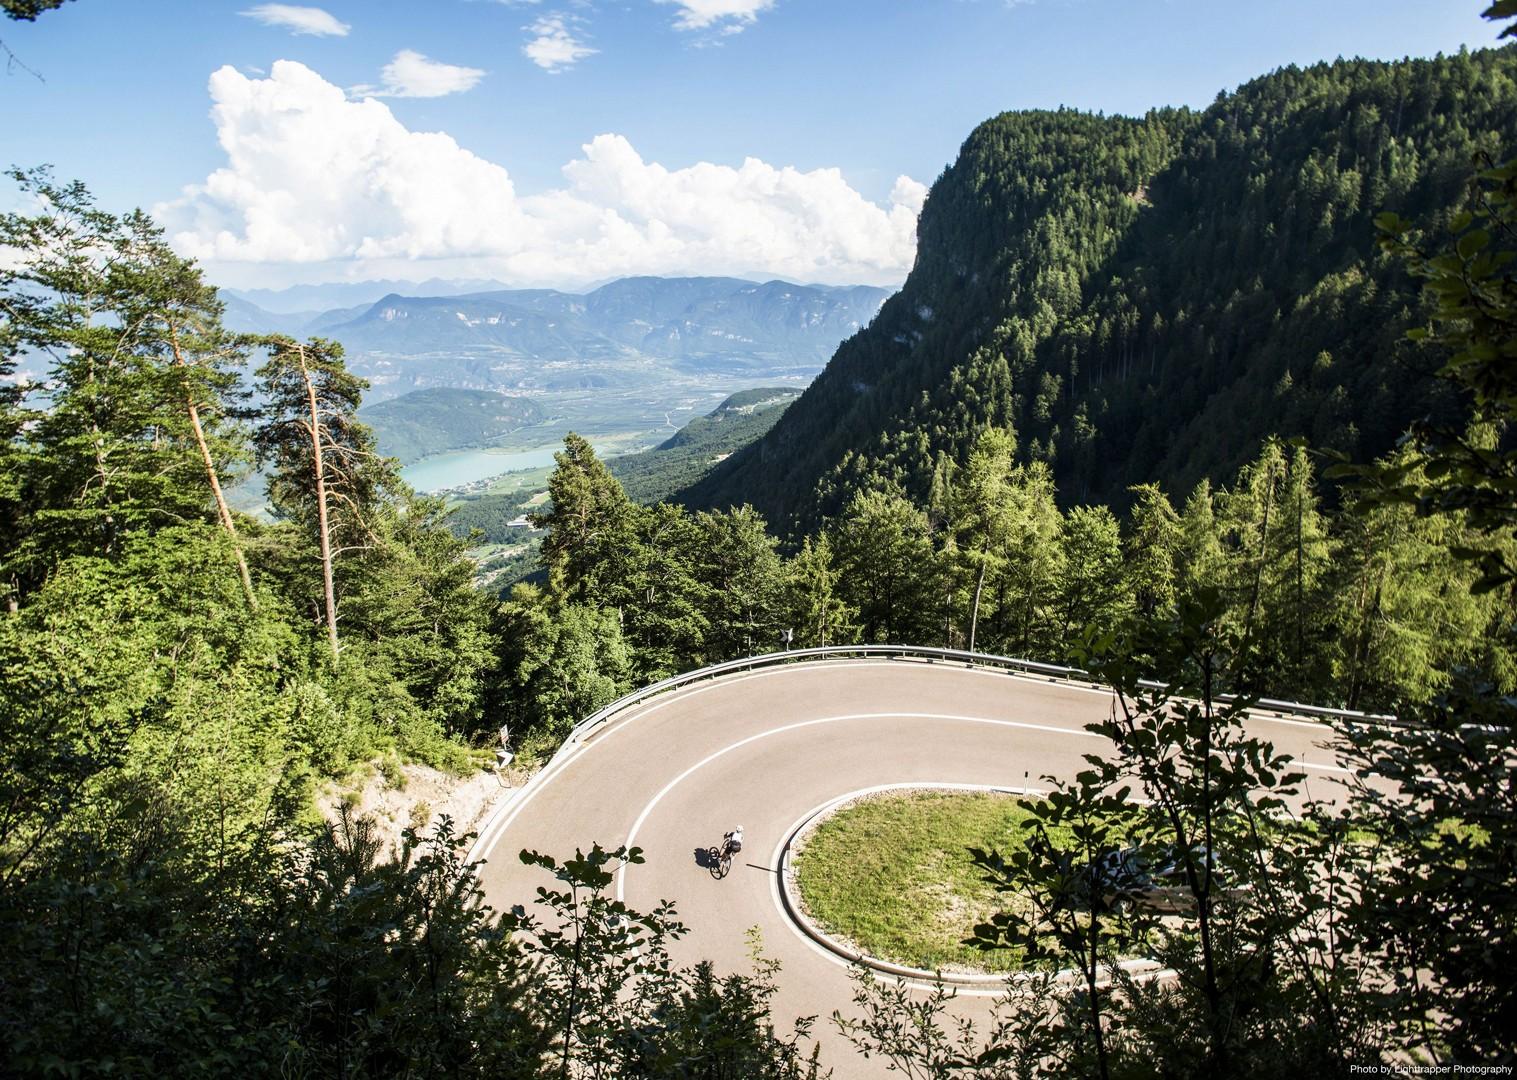 guided-road-cycling-holiday-italy-italian-alps.jpg - Italy - Italian Alps - Guided Road Cycling Holiday - Road Cycling